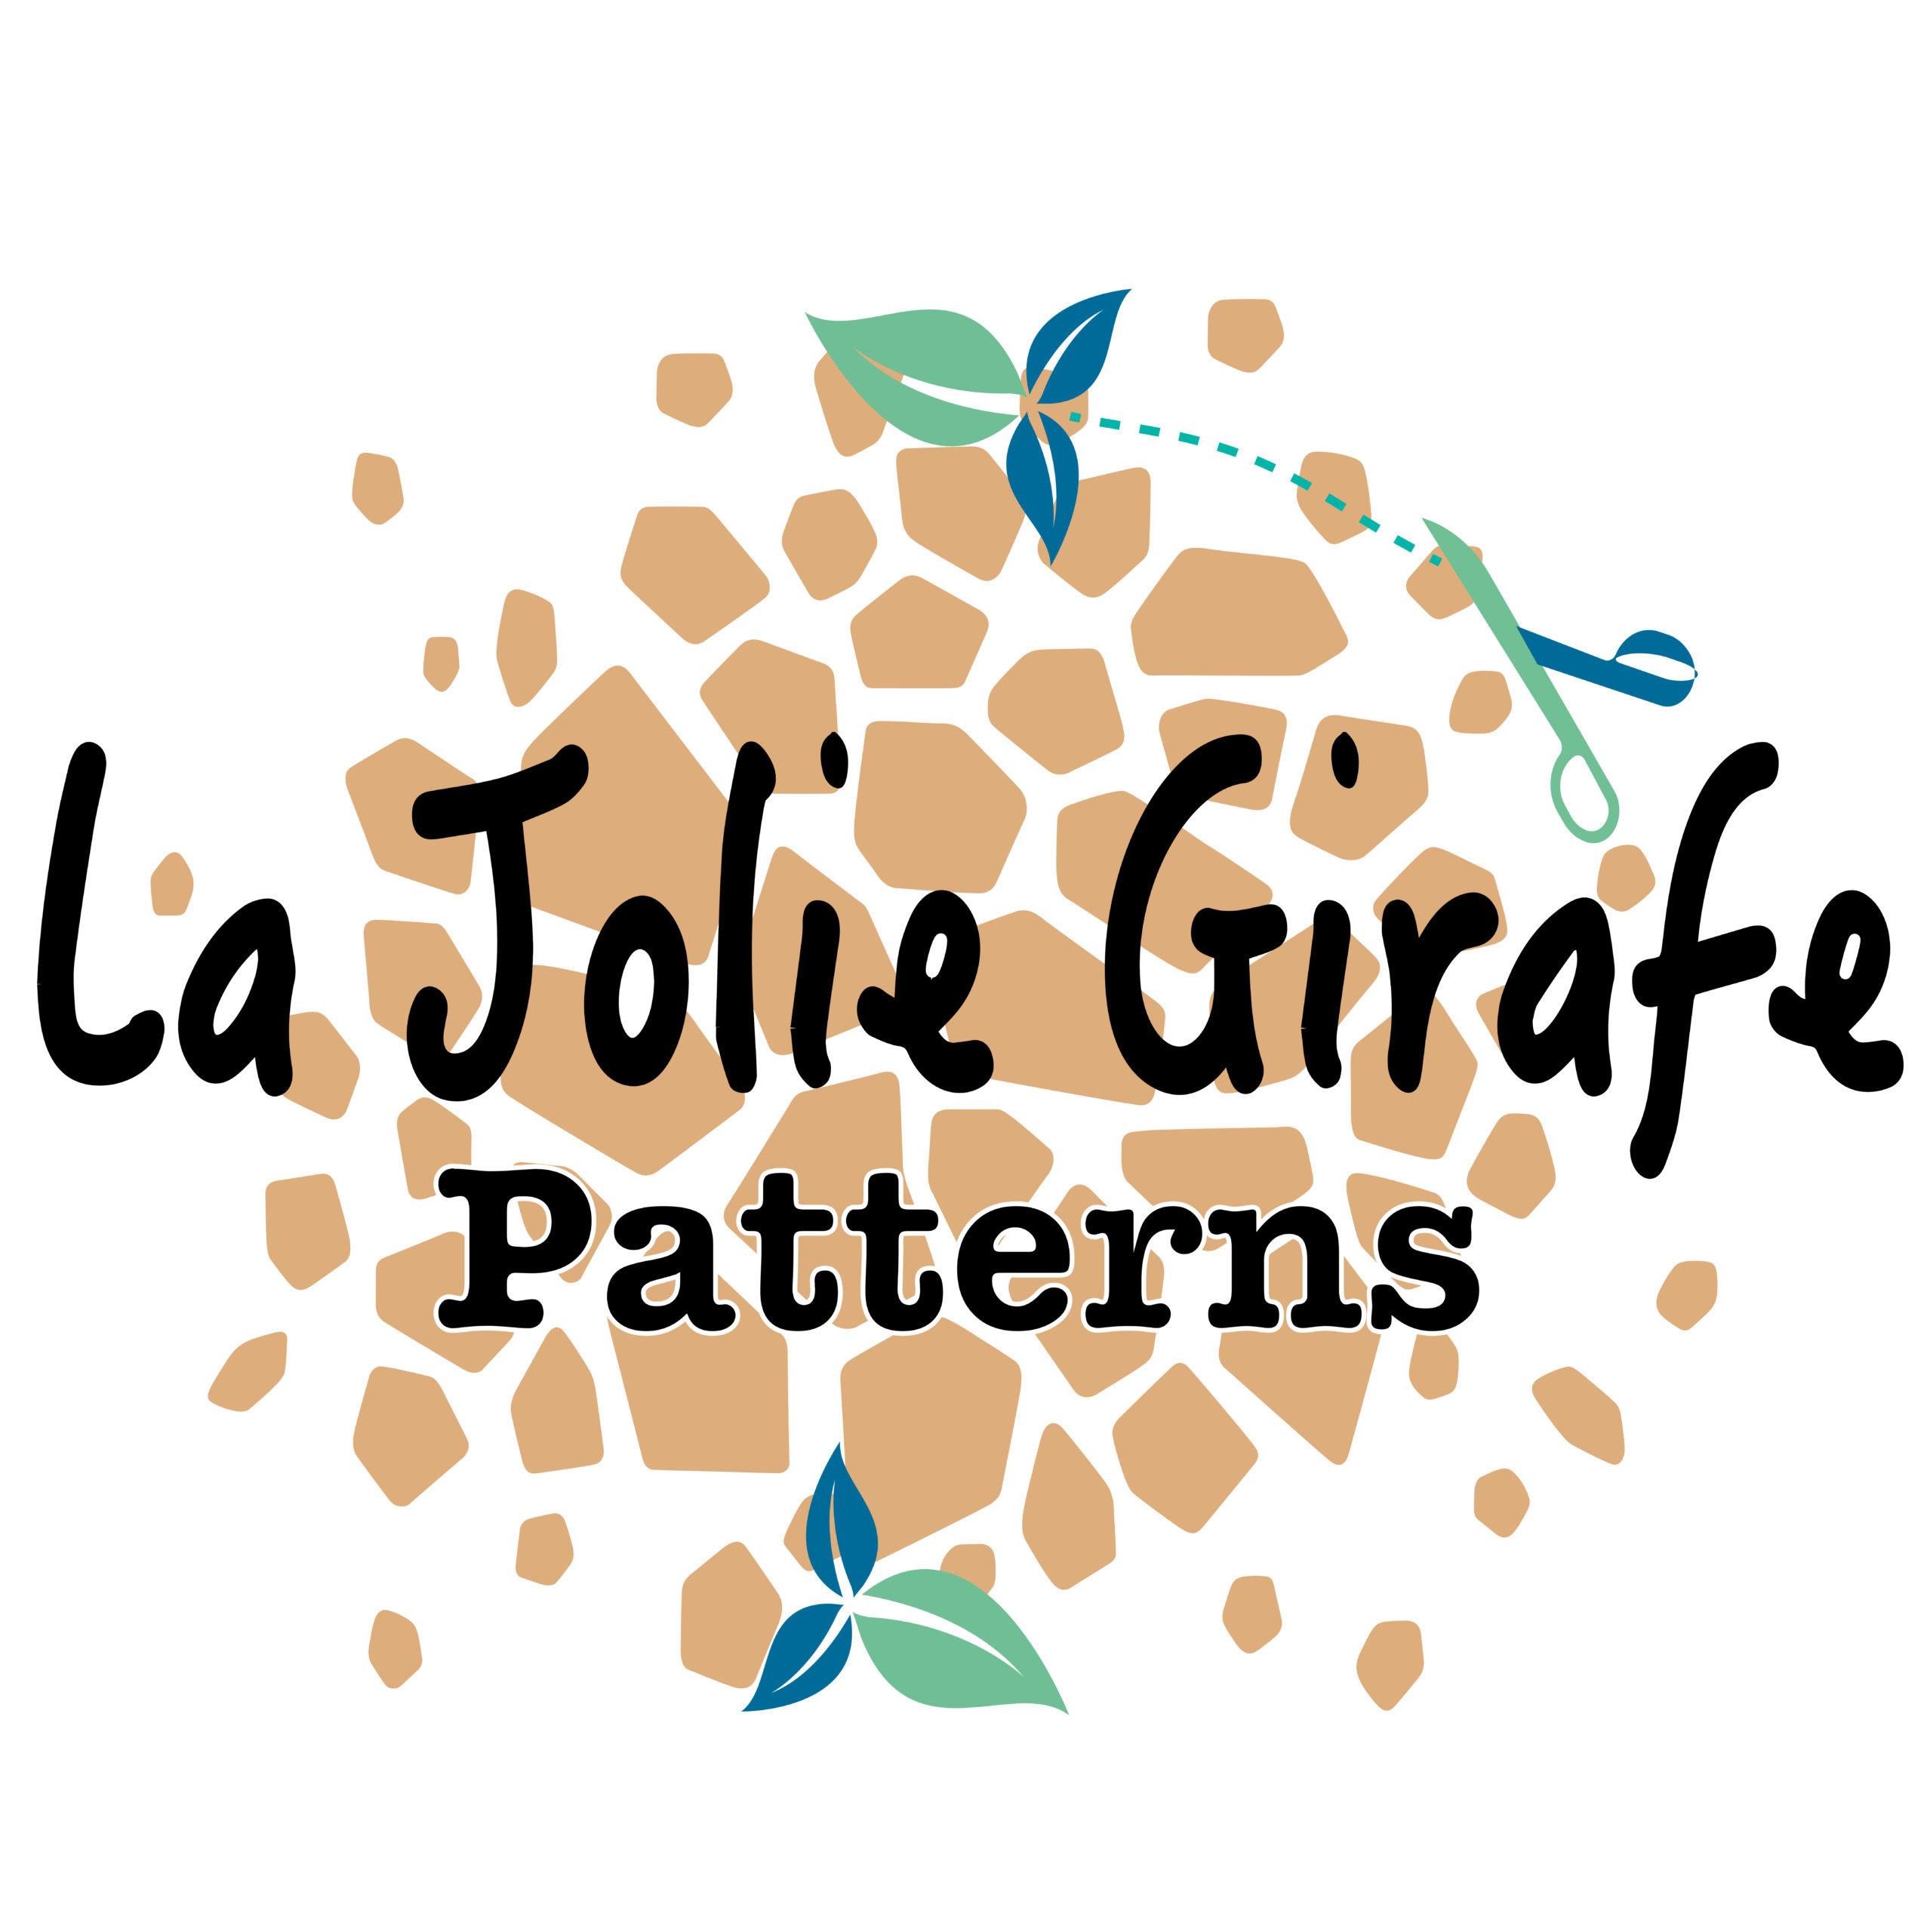 La Jolie Girafe